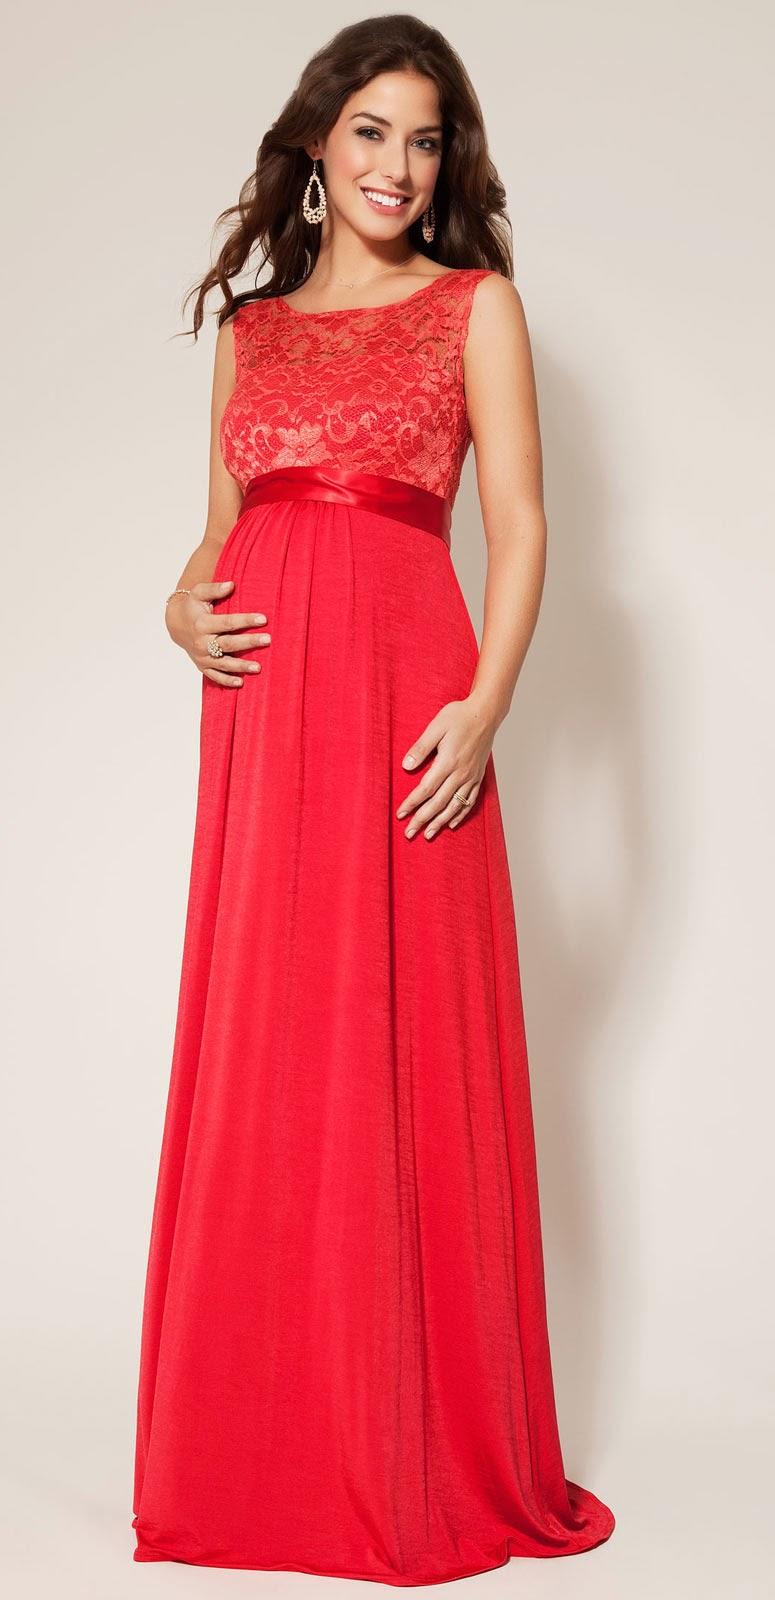 Designer Red Maternity Wedding Dresses Photos HD Ideas